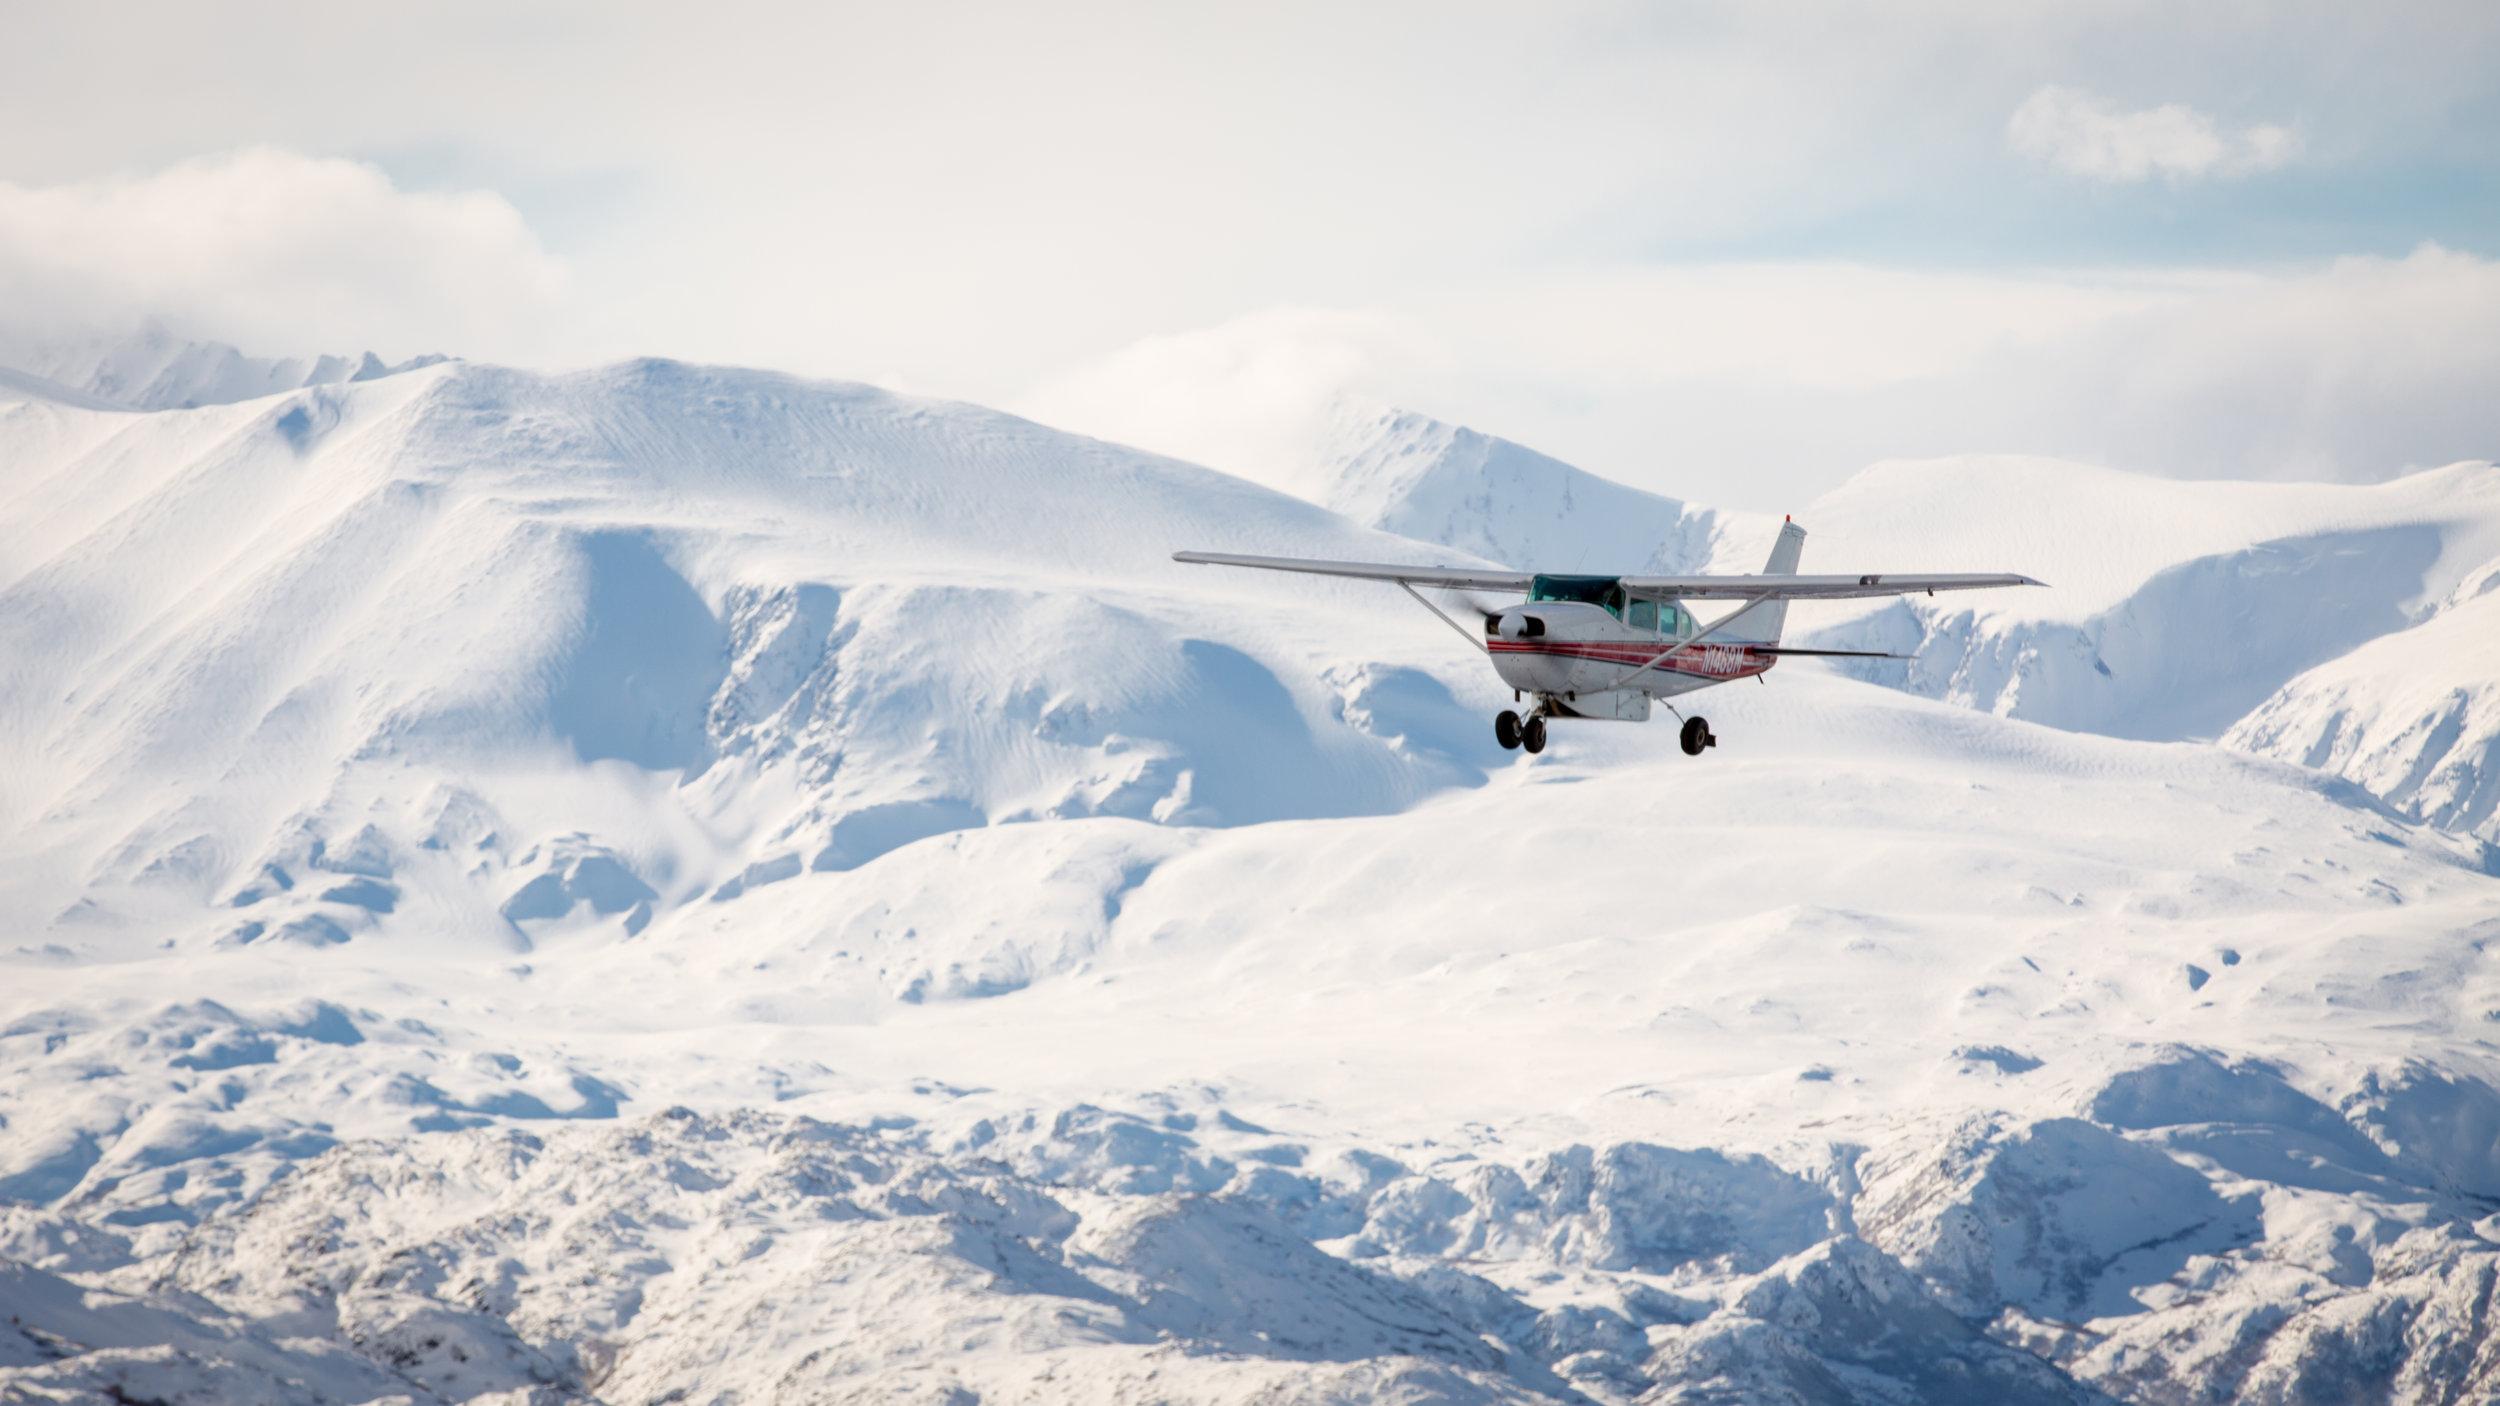 Partner with Jim and Lisa to Impact Alaska. - Contribute>>